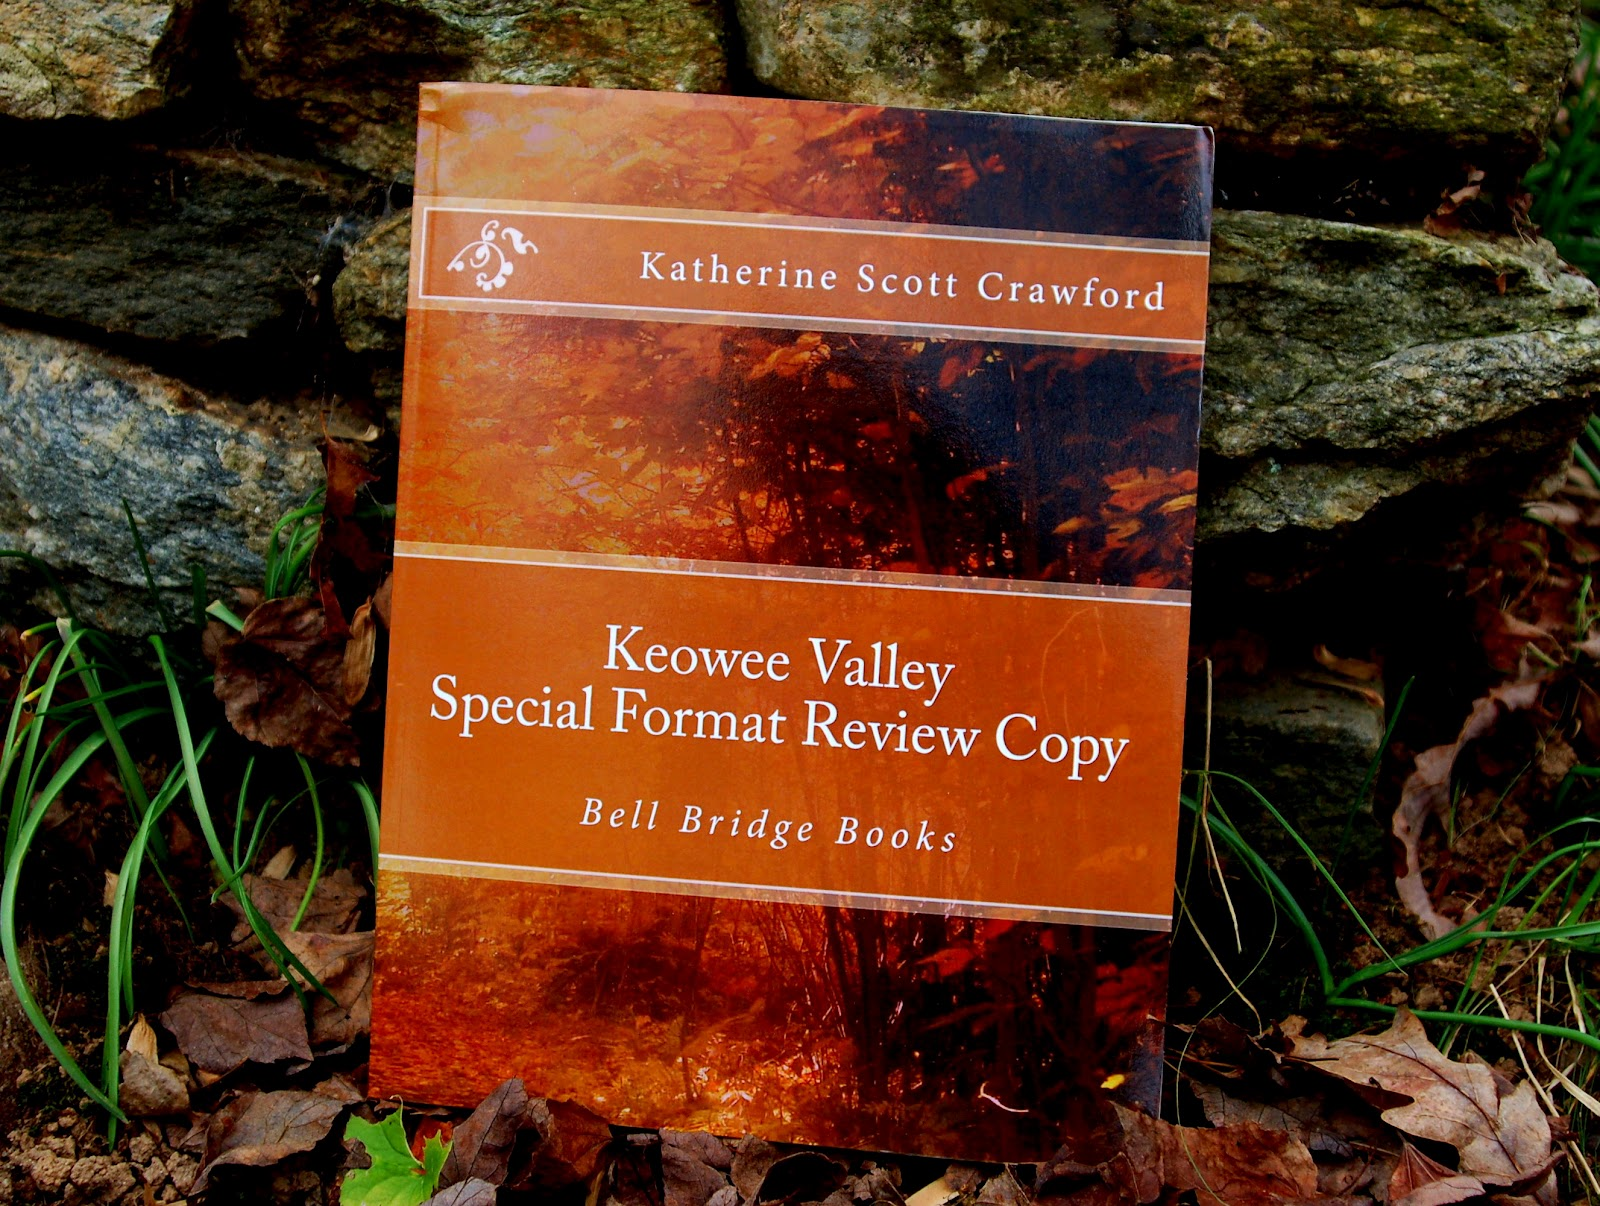 http://1.bp.blogspot.com/-W8Noe_mNcbY/UAV4NprKEOI/AAAAAAAABs0/ZzN53otrI7s/s1600/Keowee+Valley+review+copy.JPG